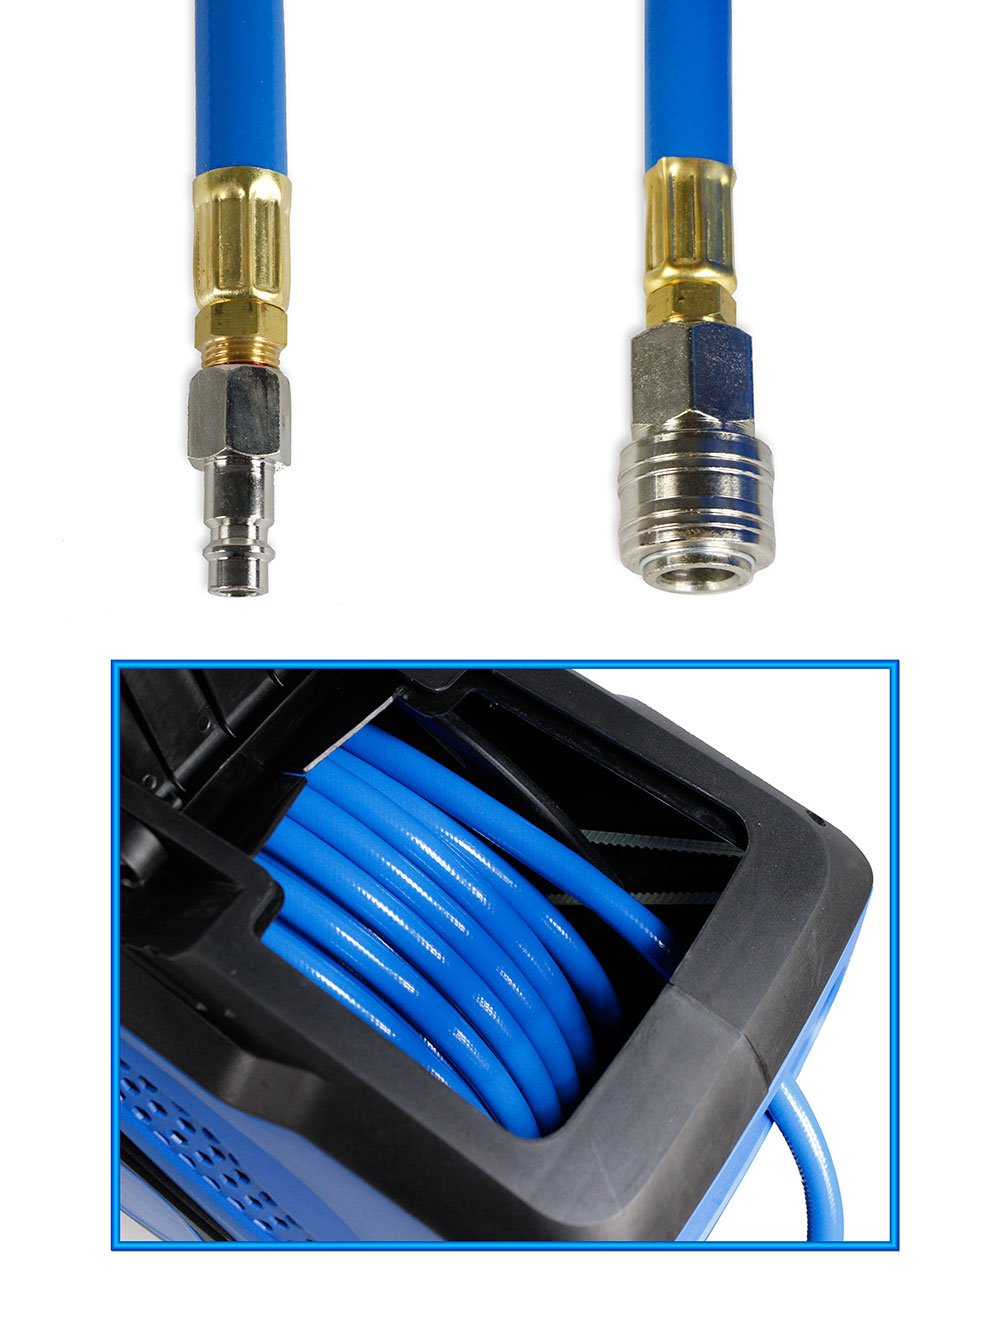 vetrineinrete® Automático Manguera De Aire Comprimido 20 m retráctil con cuaderno Bobina alargador para compresor Taller Mecánico neumáticos P44: Amazon.es: ...